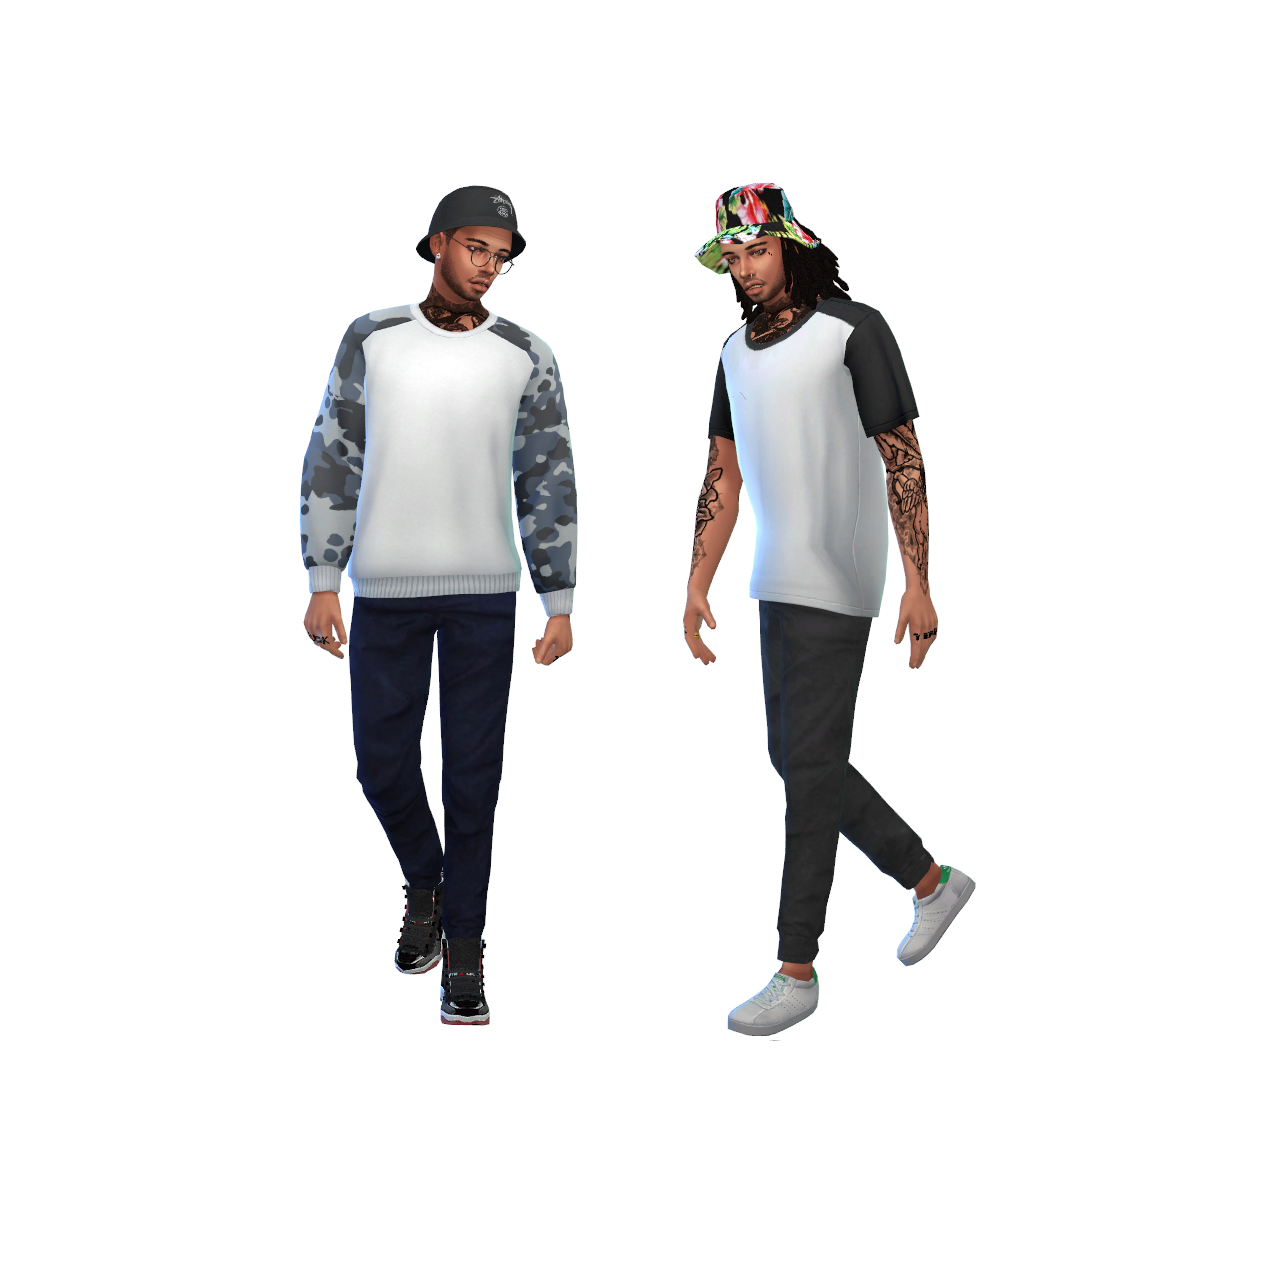 The Sims  Nike Shoes Tumblr